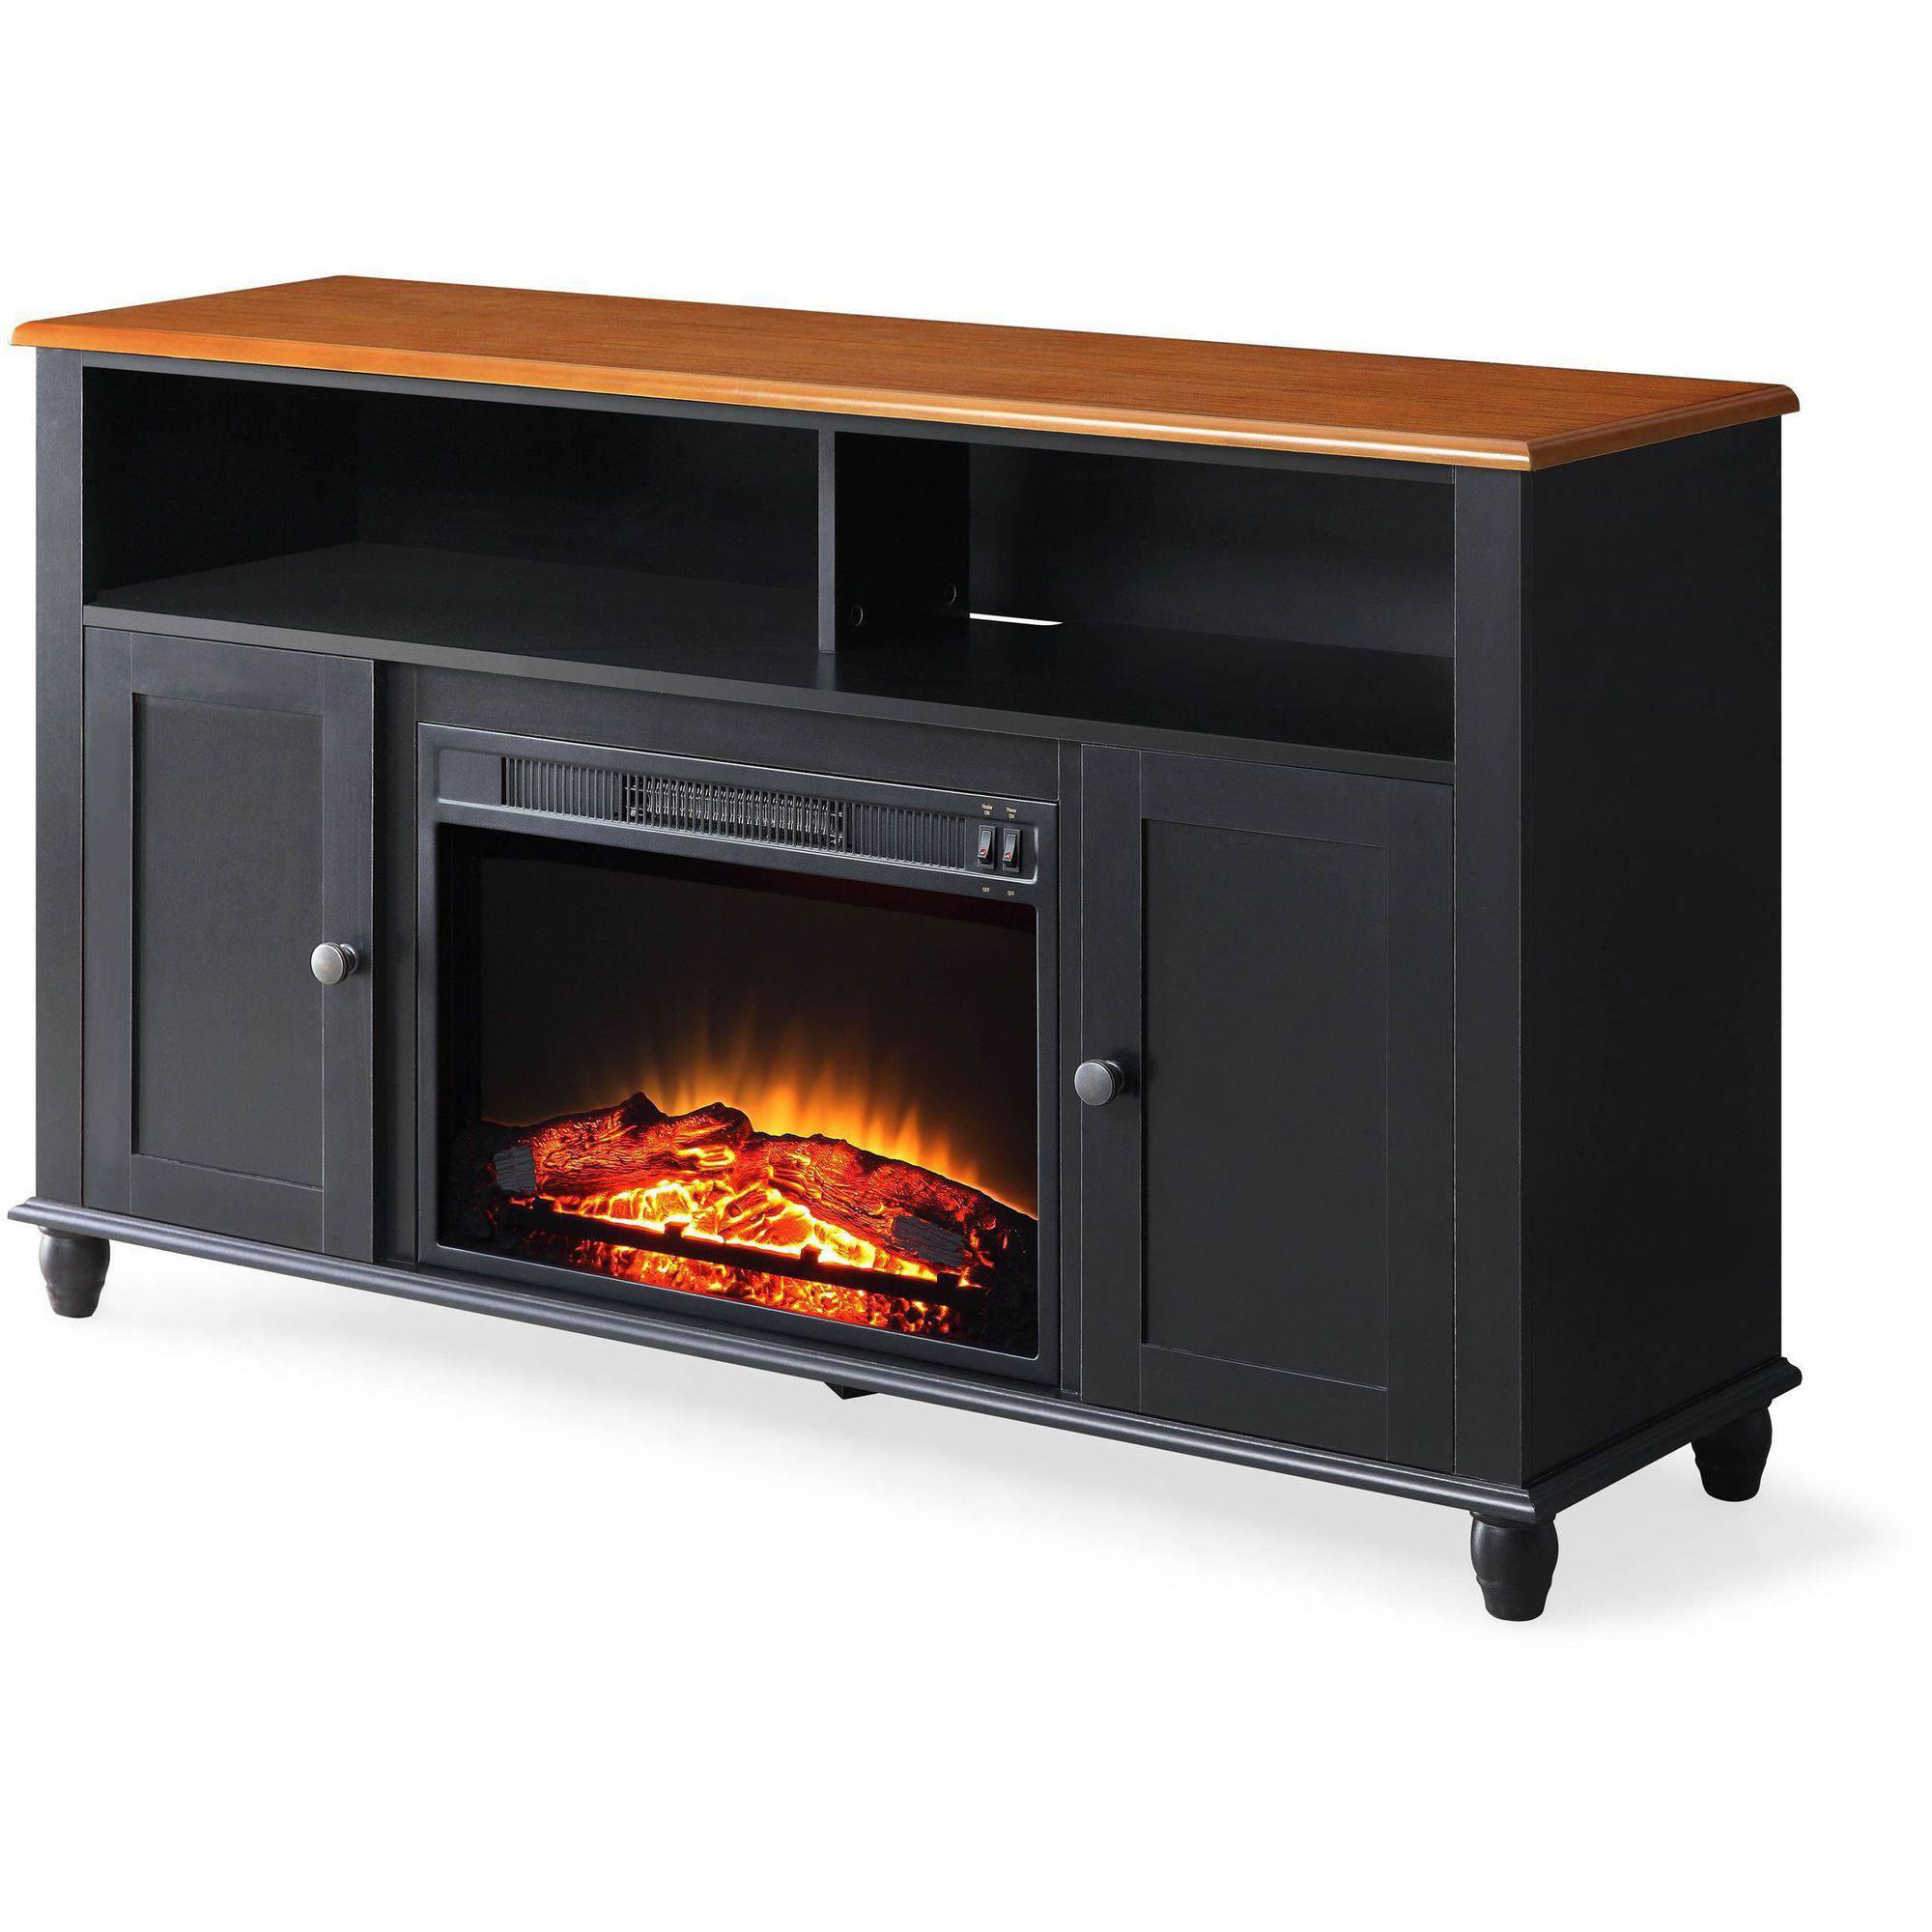 Better Homes&gardens Media Fireplace - Walmart.com